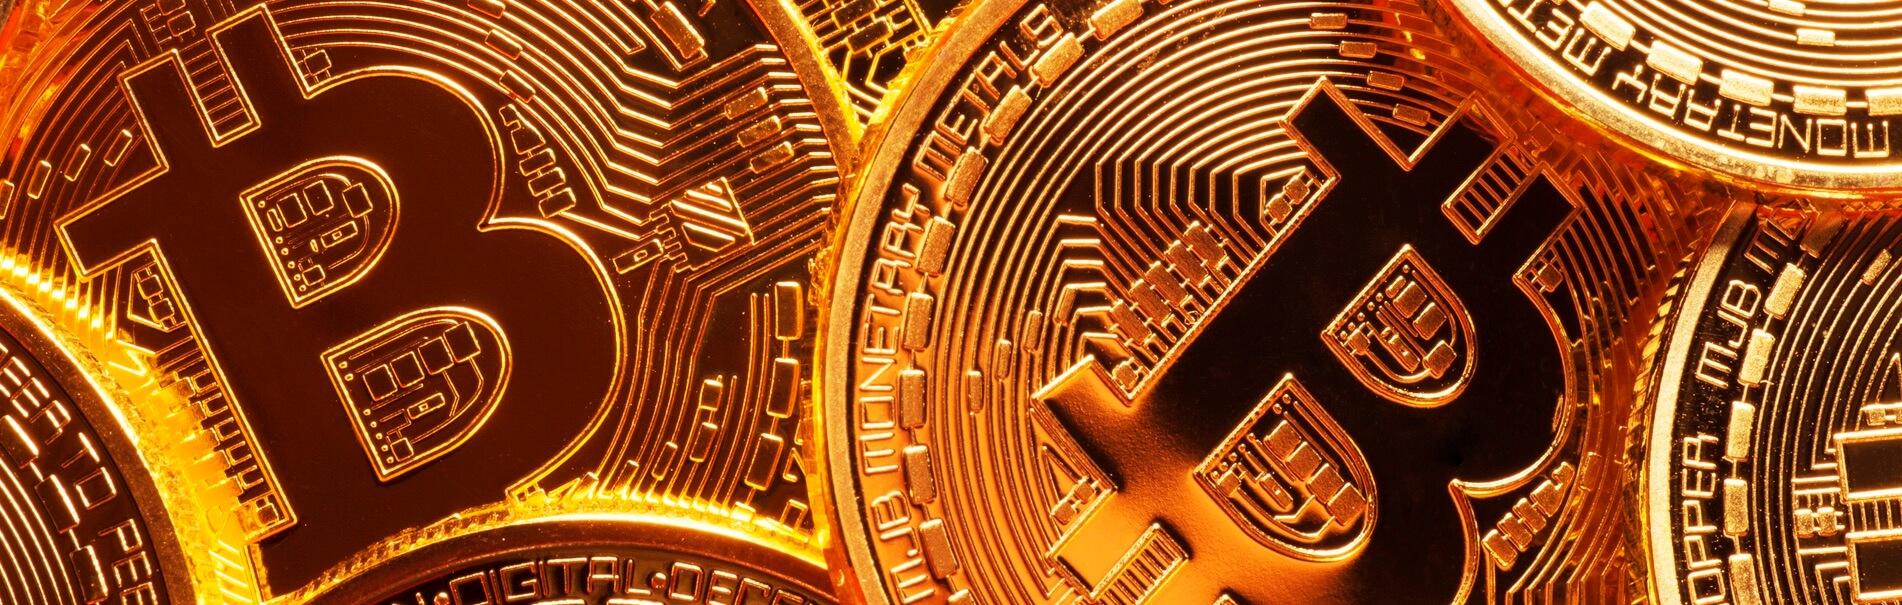 maya coin cryptocurrency news